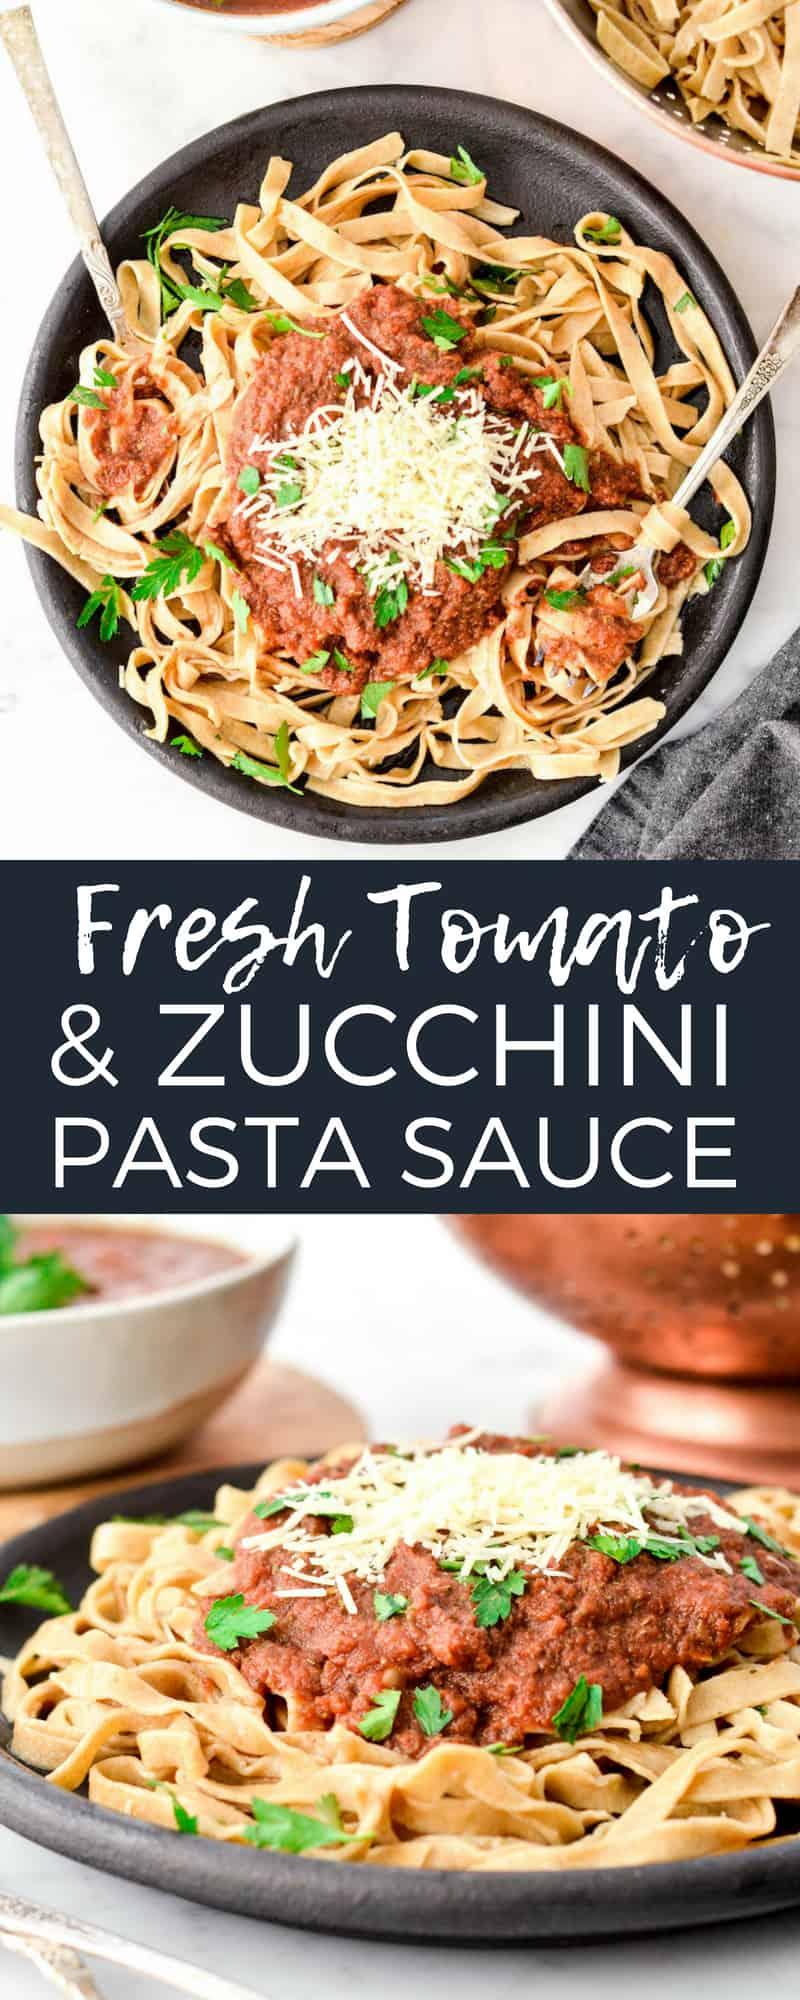 Fresh Tomato & Zucchini Pasta Sauce made in the blender! A versatile marinara sauce that is loaded with sneaky veggies! Vegan, paleo, gluten-free and dairy-free! #homemadepastasauce #zucchini #zucchinipastasauce #blenderpastasauce #recipe